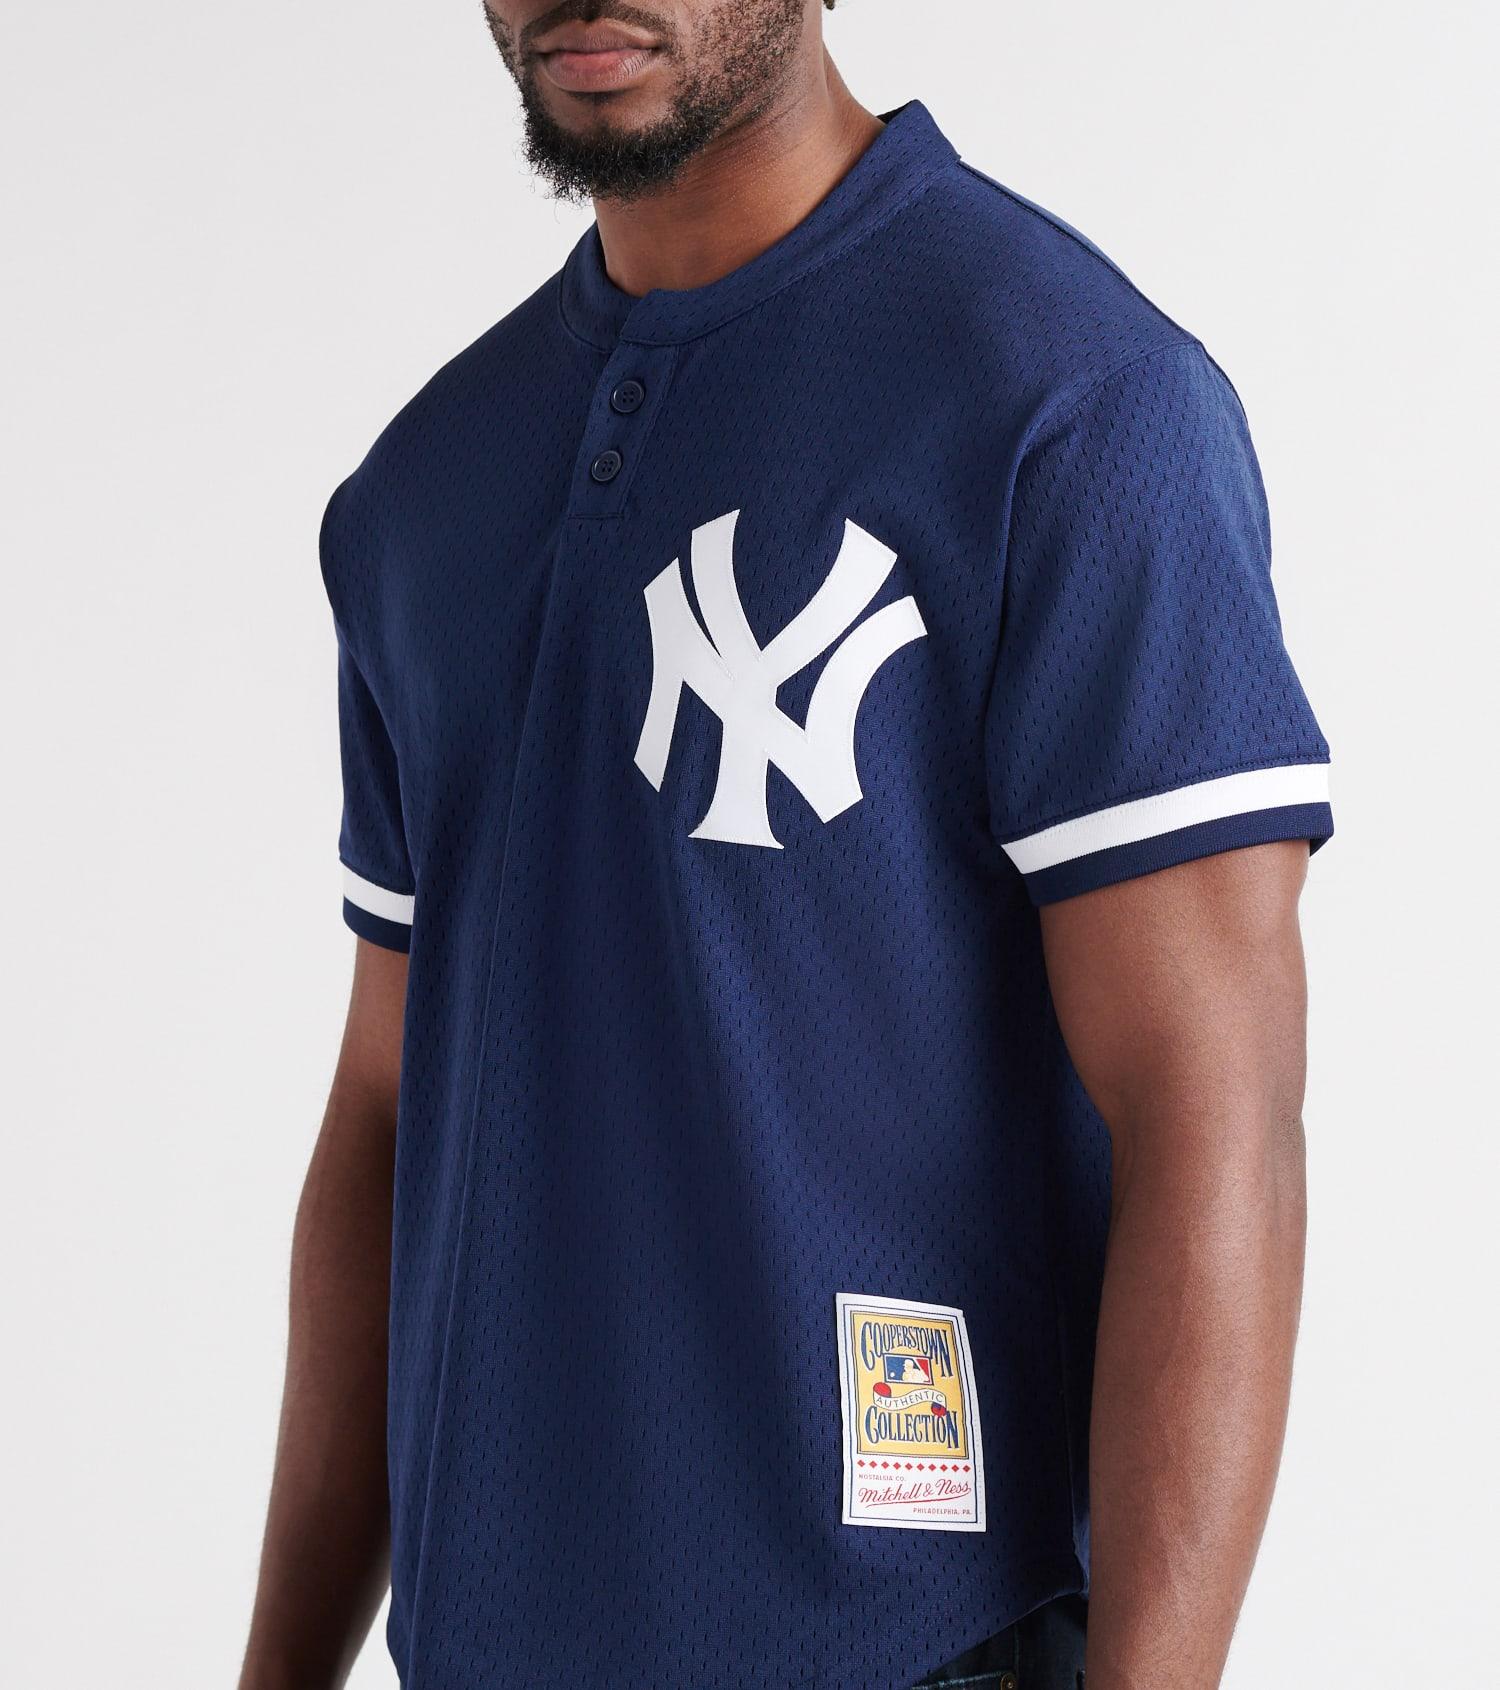 watch 097ca 5fbf6 Bernie Williams 1995 Yankees BP Jersey